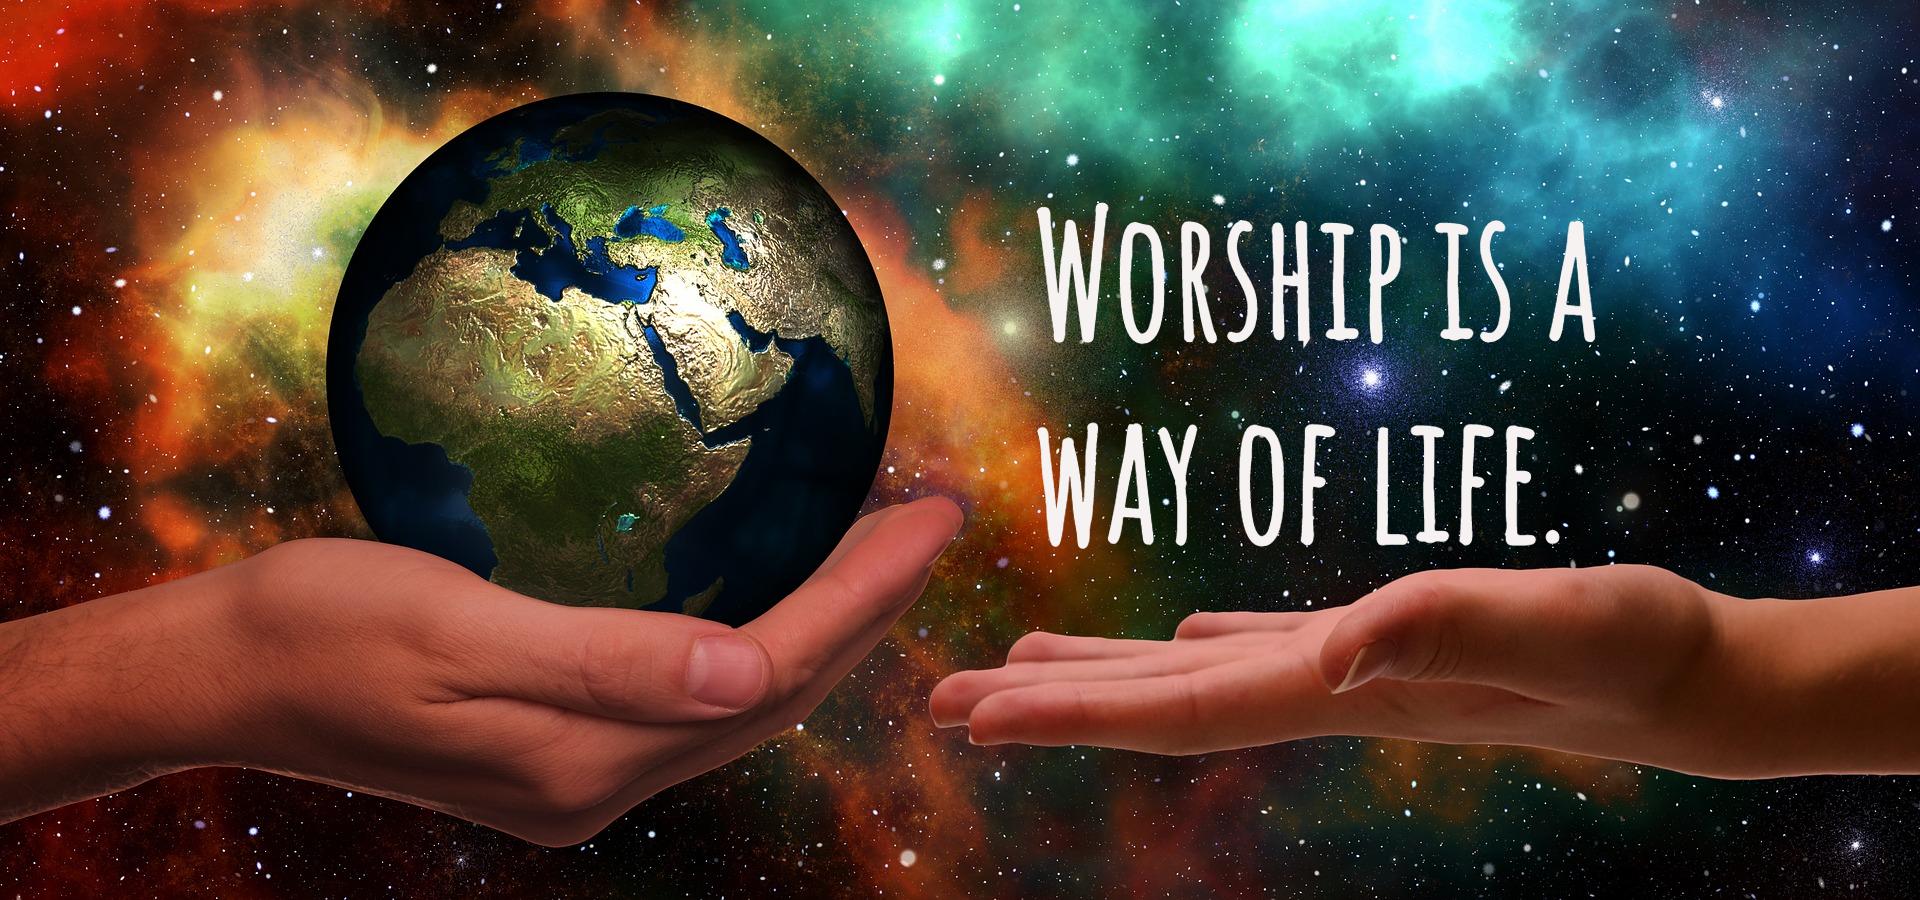 worship way of life.jpg